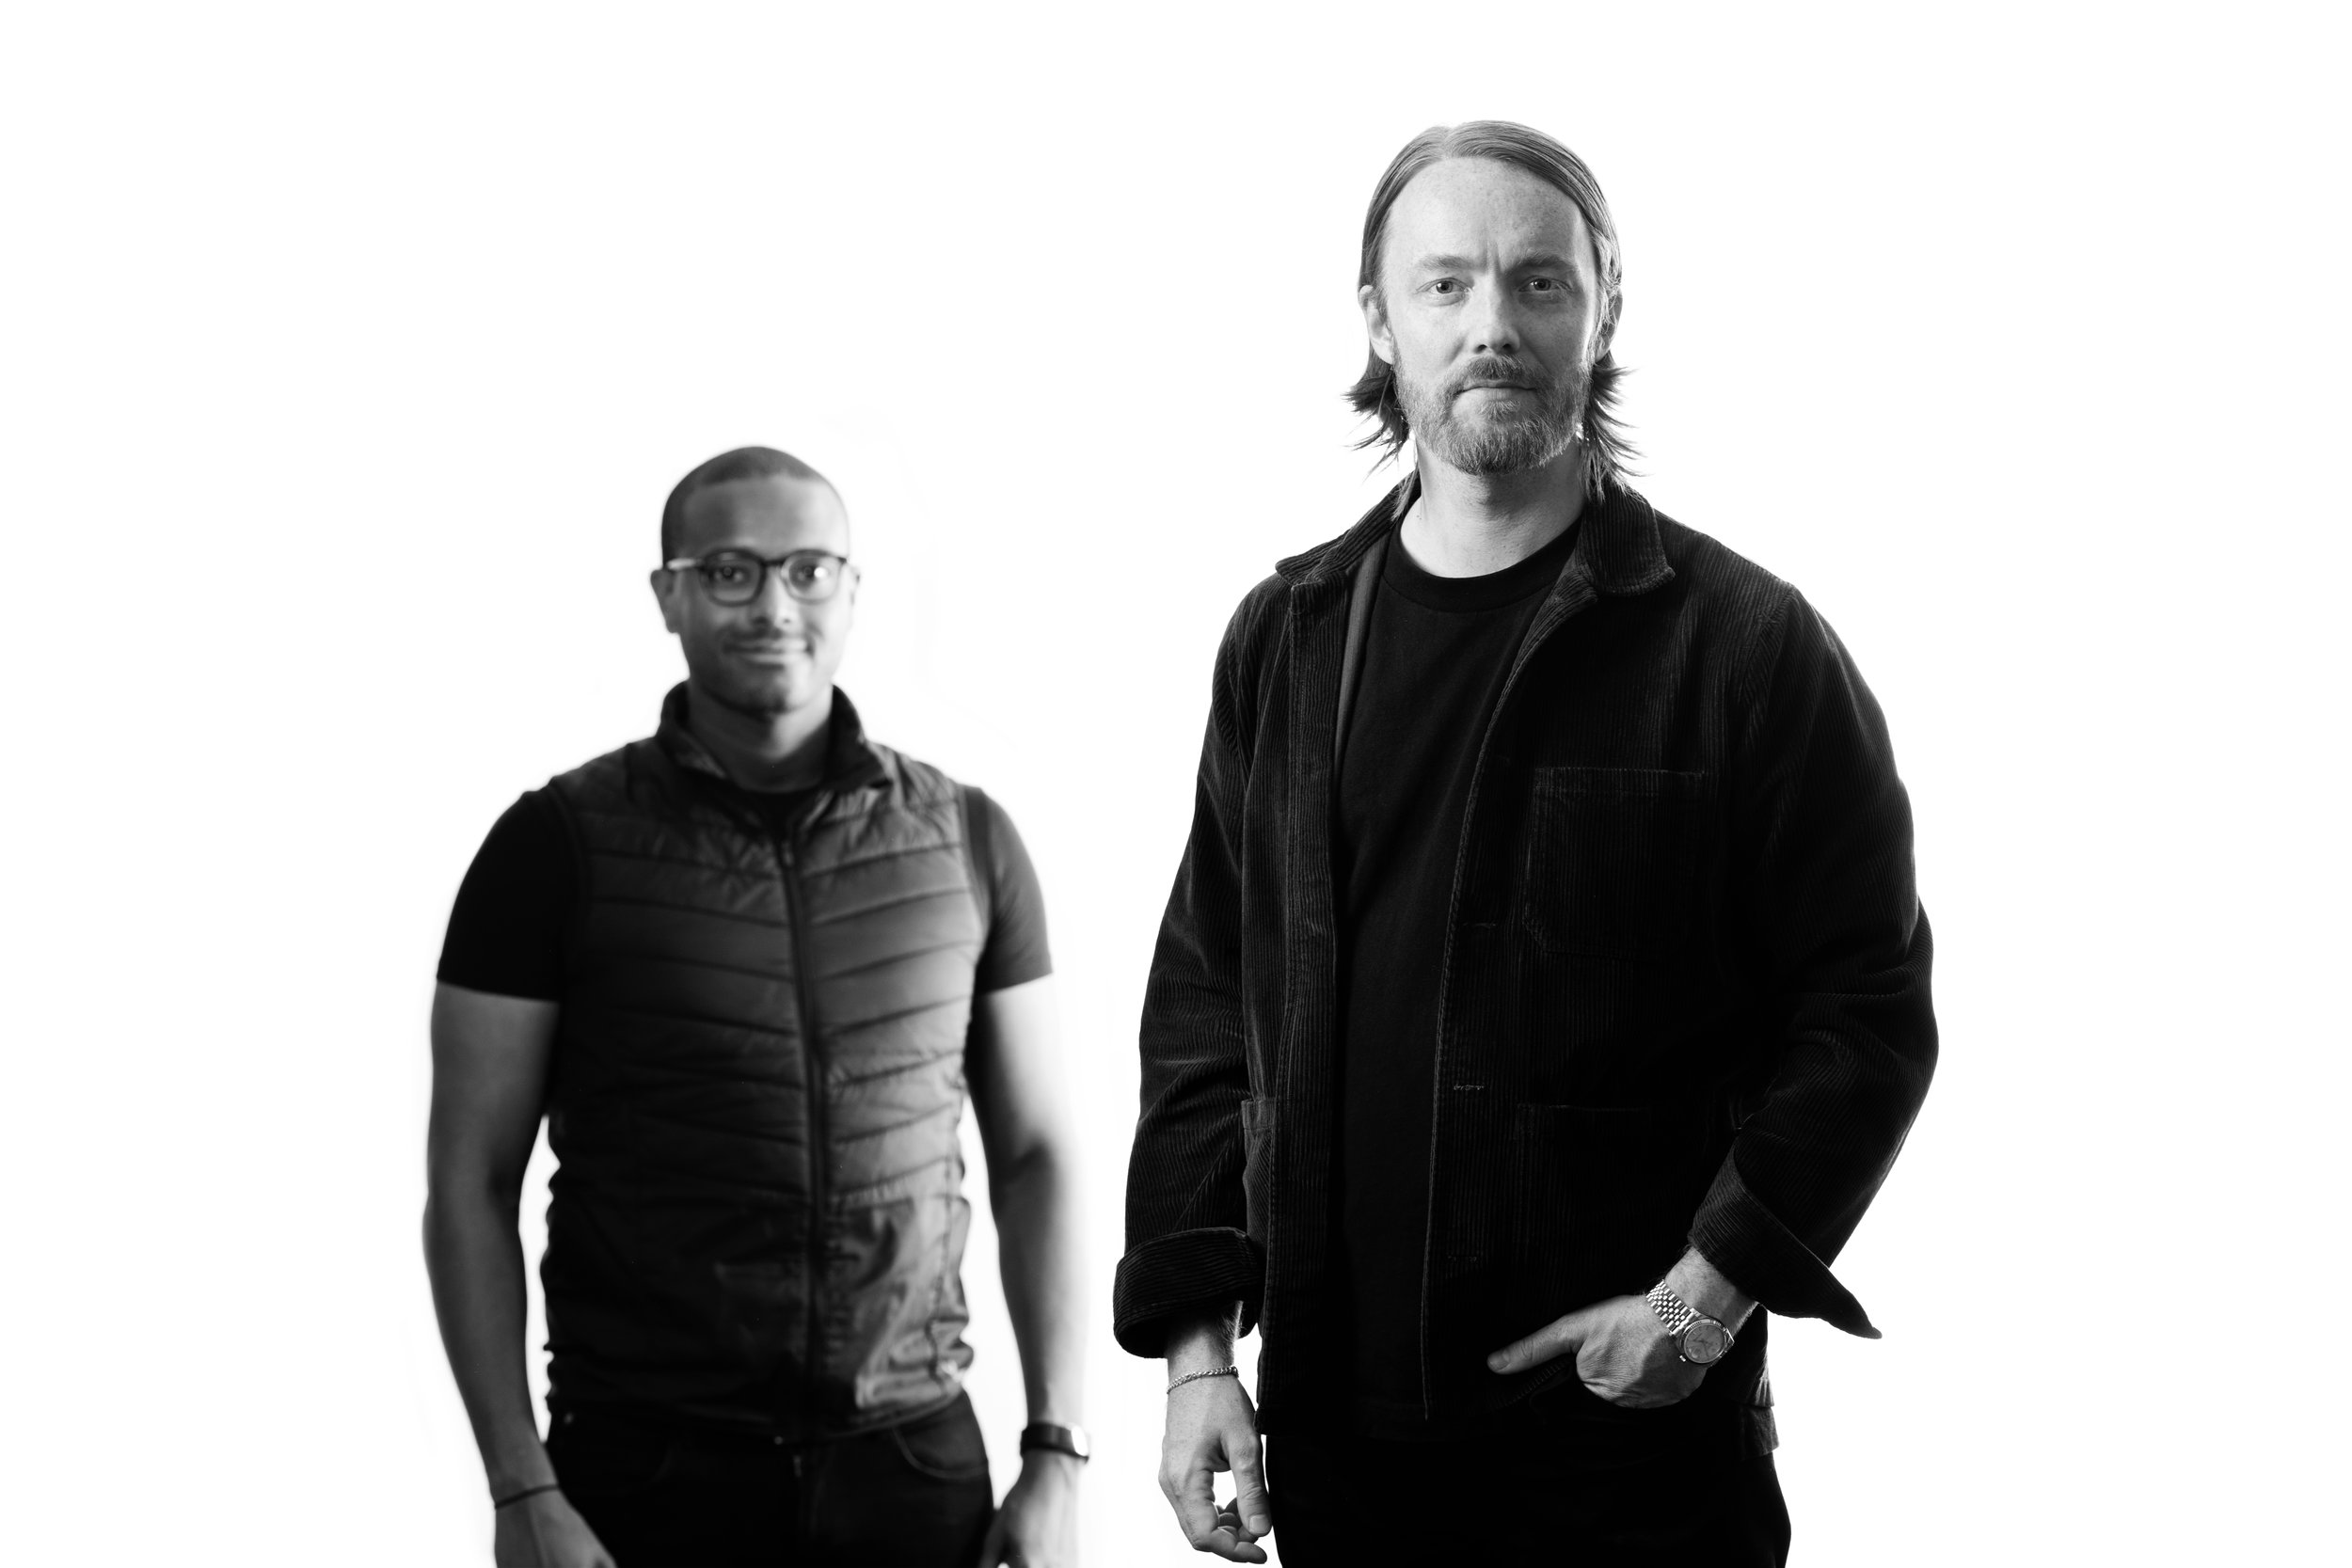 Mose Haregot and Kristofer Åkesson.  Photo: Fredric Johansson